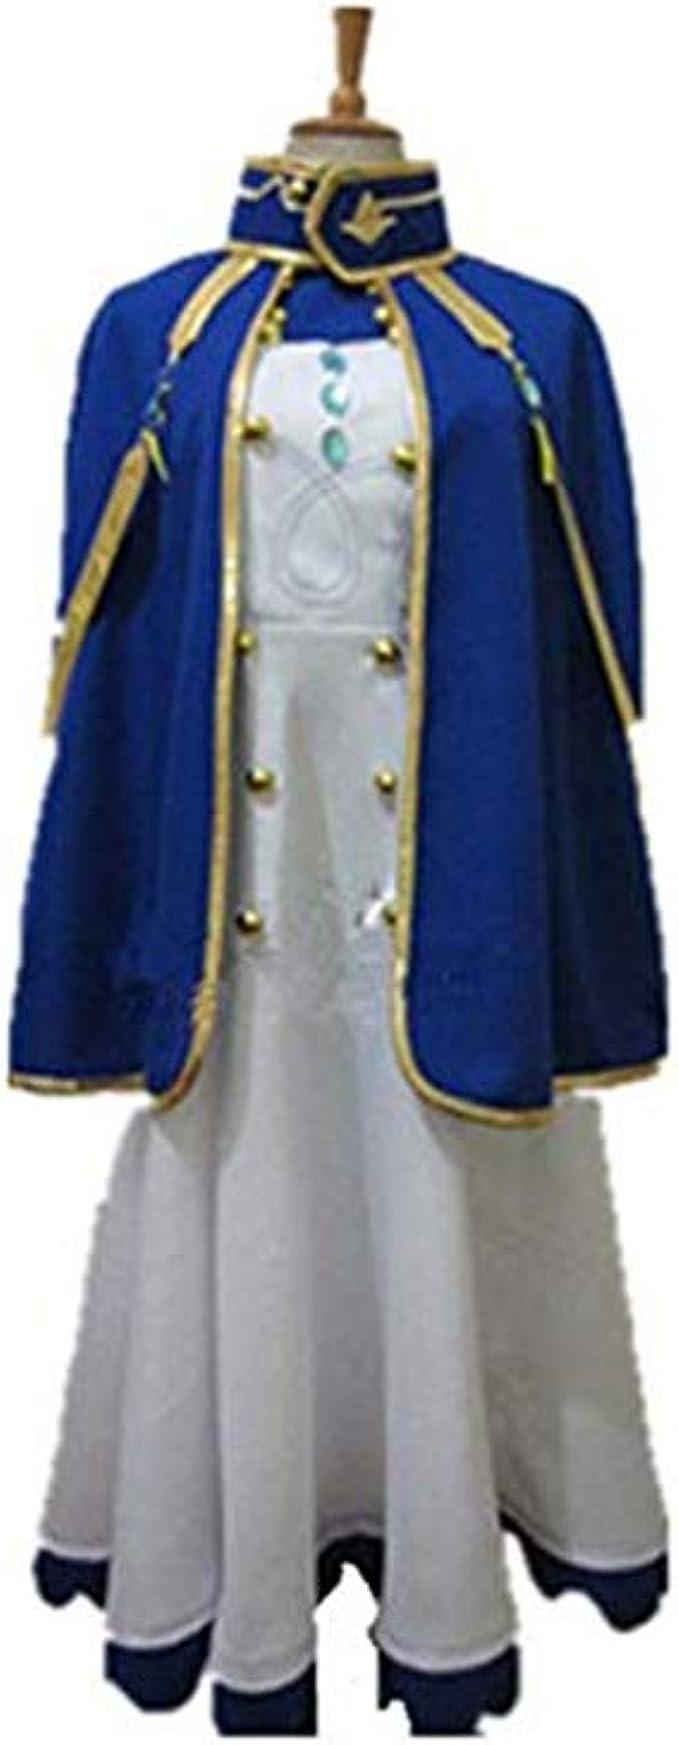 Anime Akagami no Shirayukihime Shirayuki Chemist Uniform Cosplay Dress